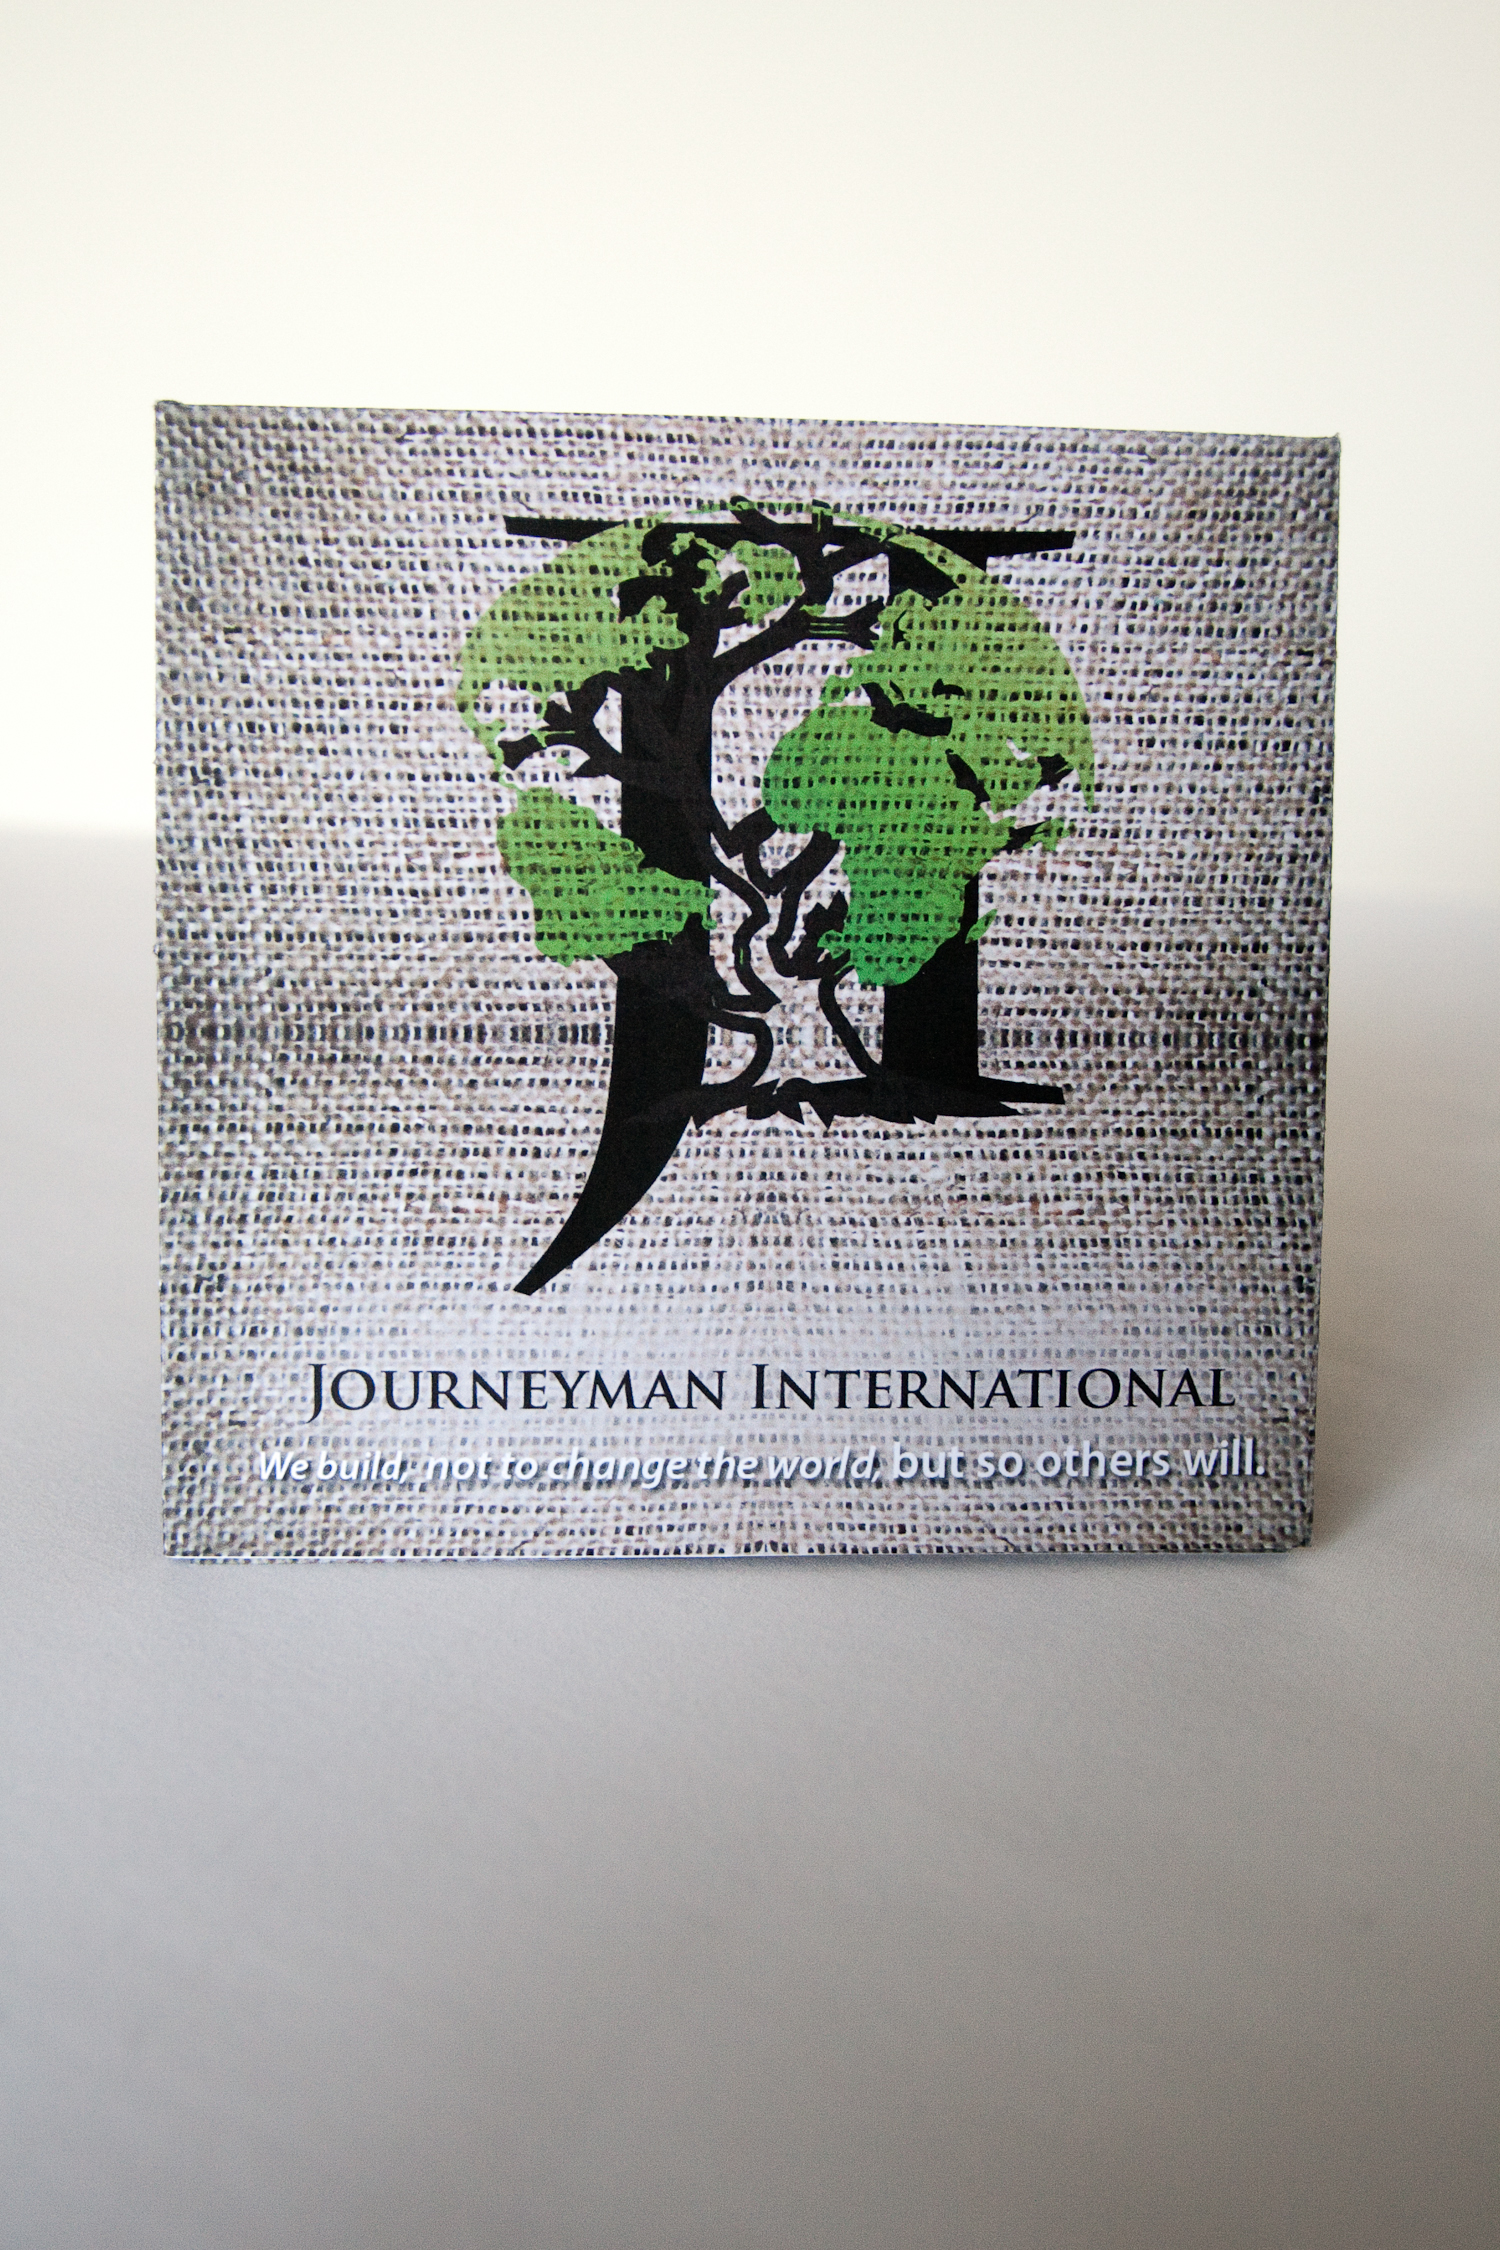 journeyman-6959.jpg